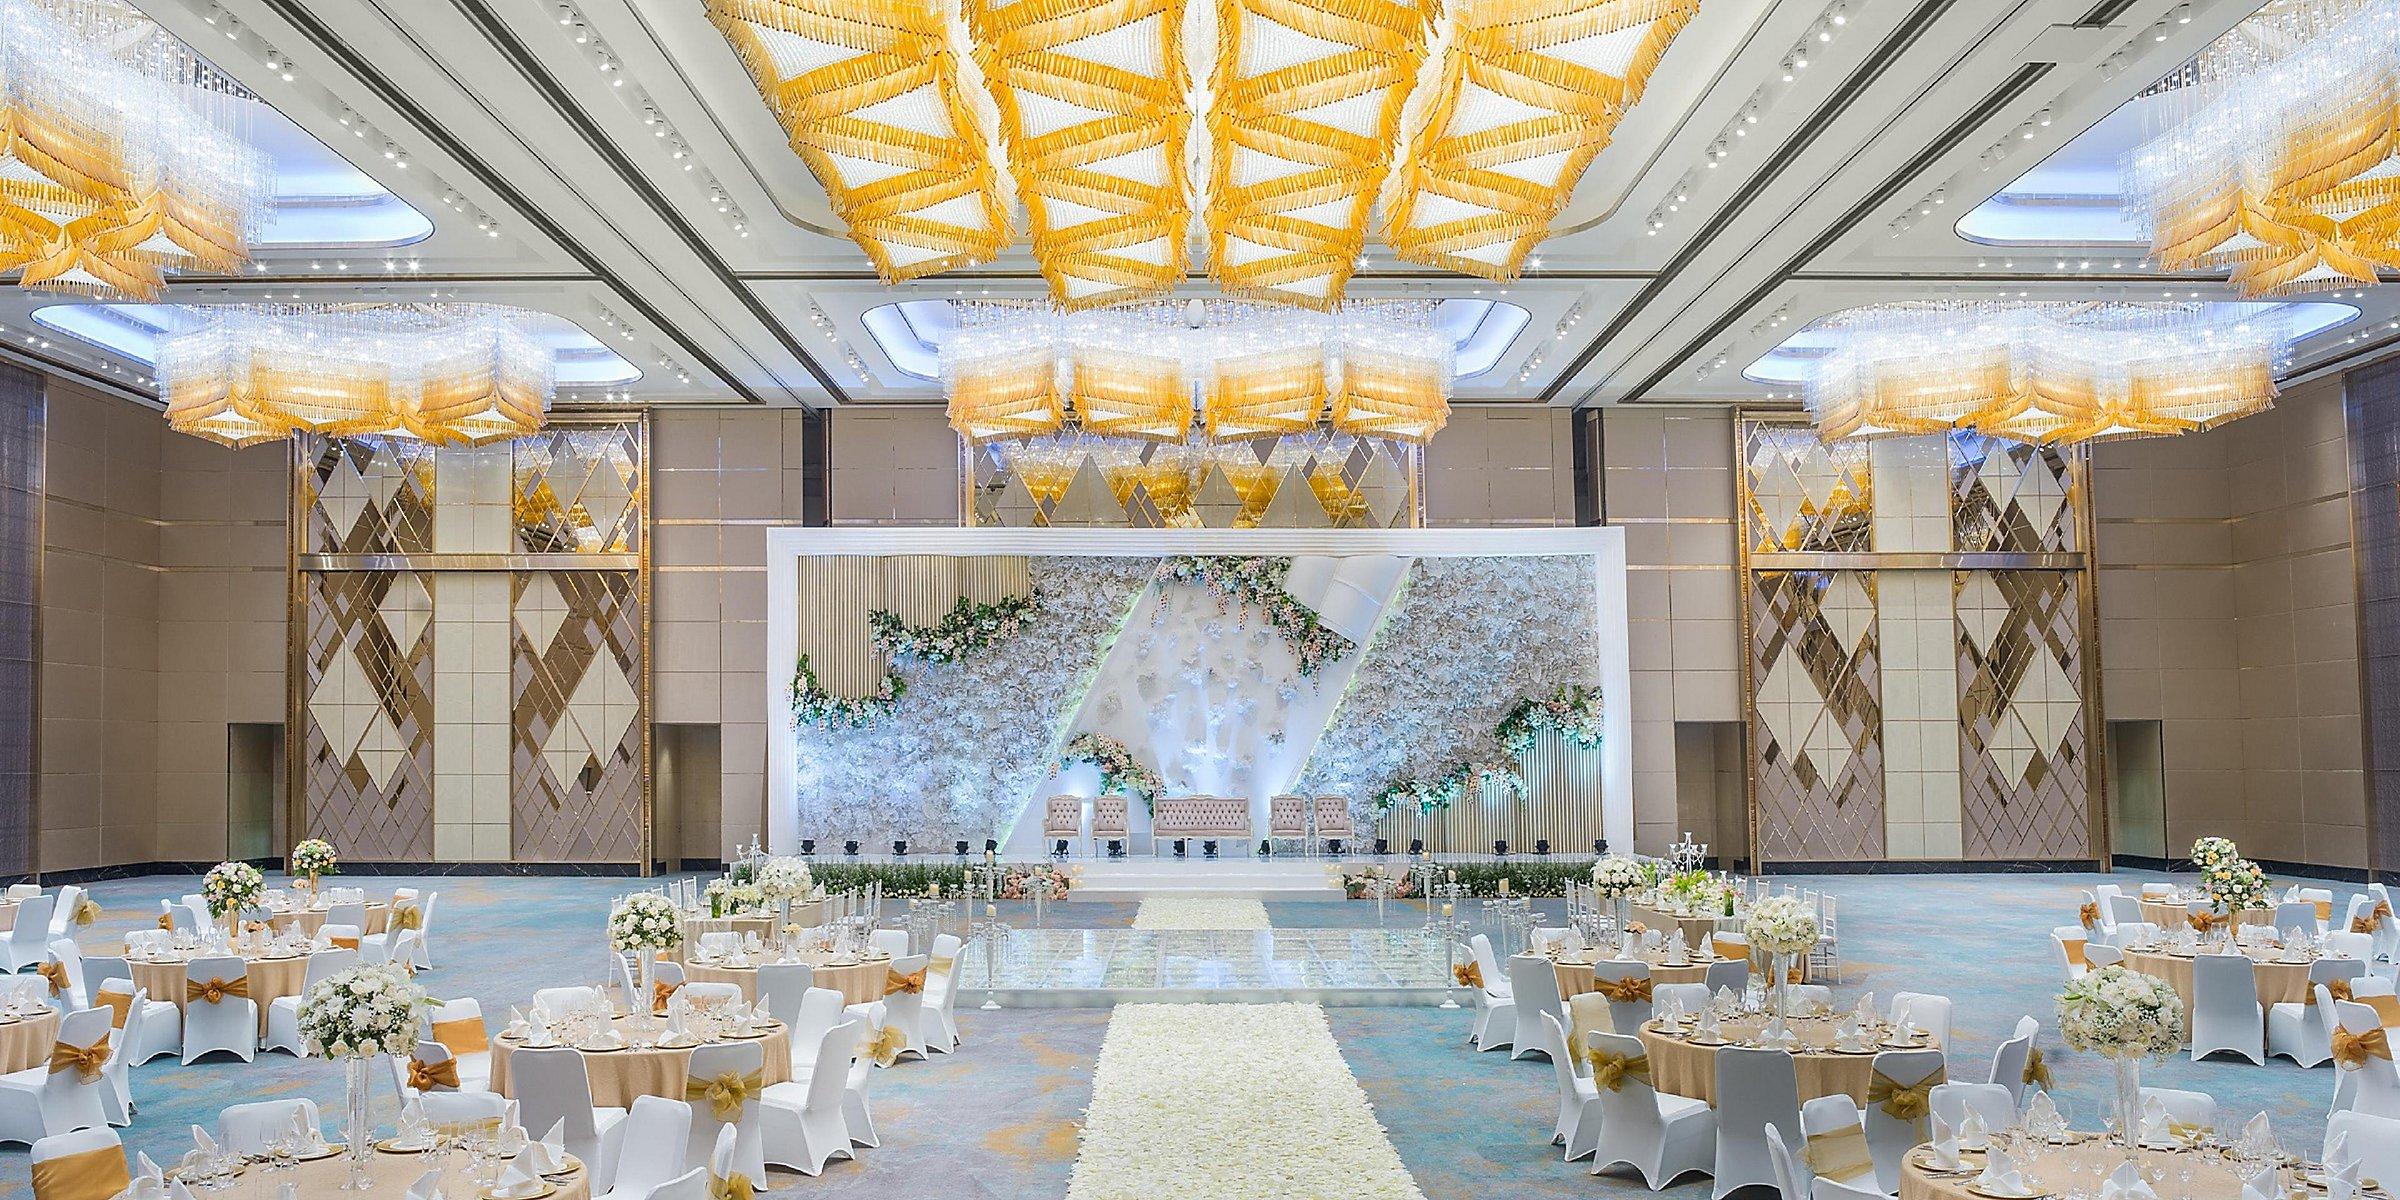 Intercontinental Jakarta Pondok Indah Hotel Meeting Rooms Wedding Rentals